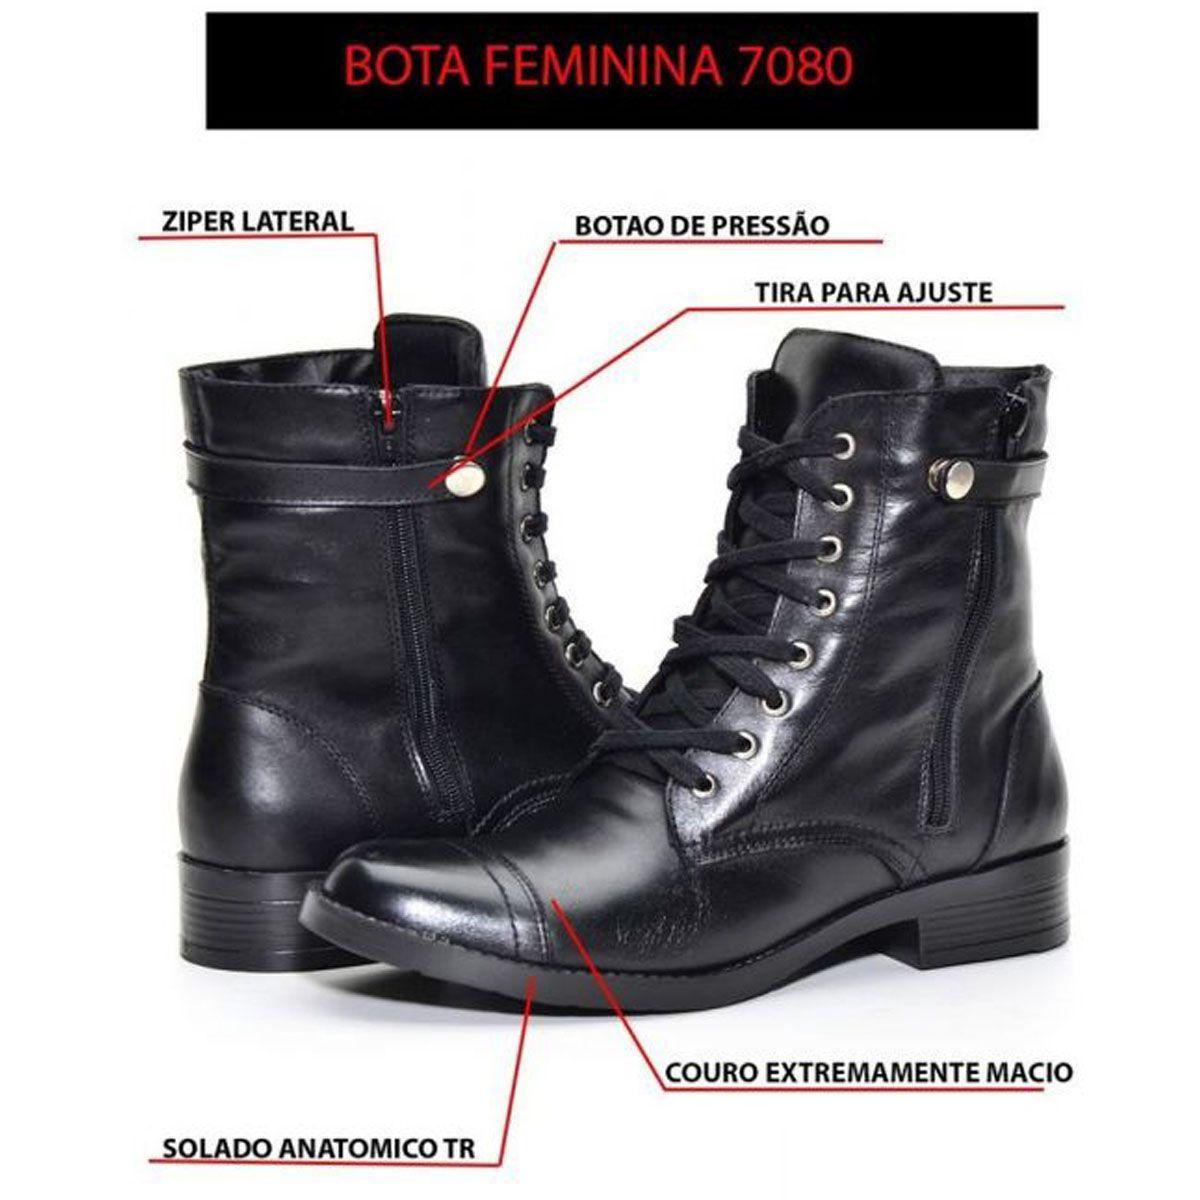 Coturno de cano médio feminino de couro legítimo na cor preta